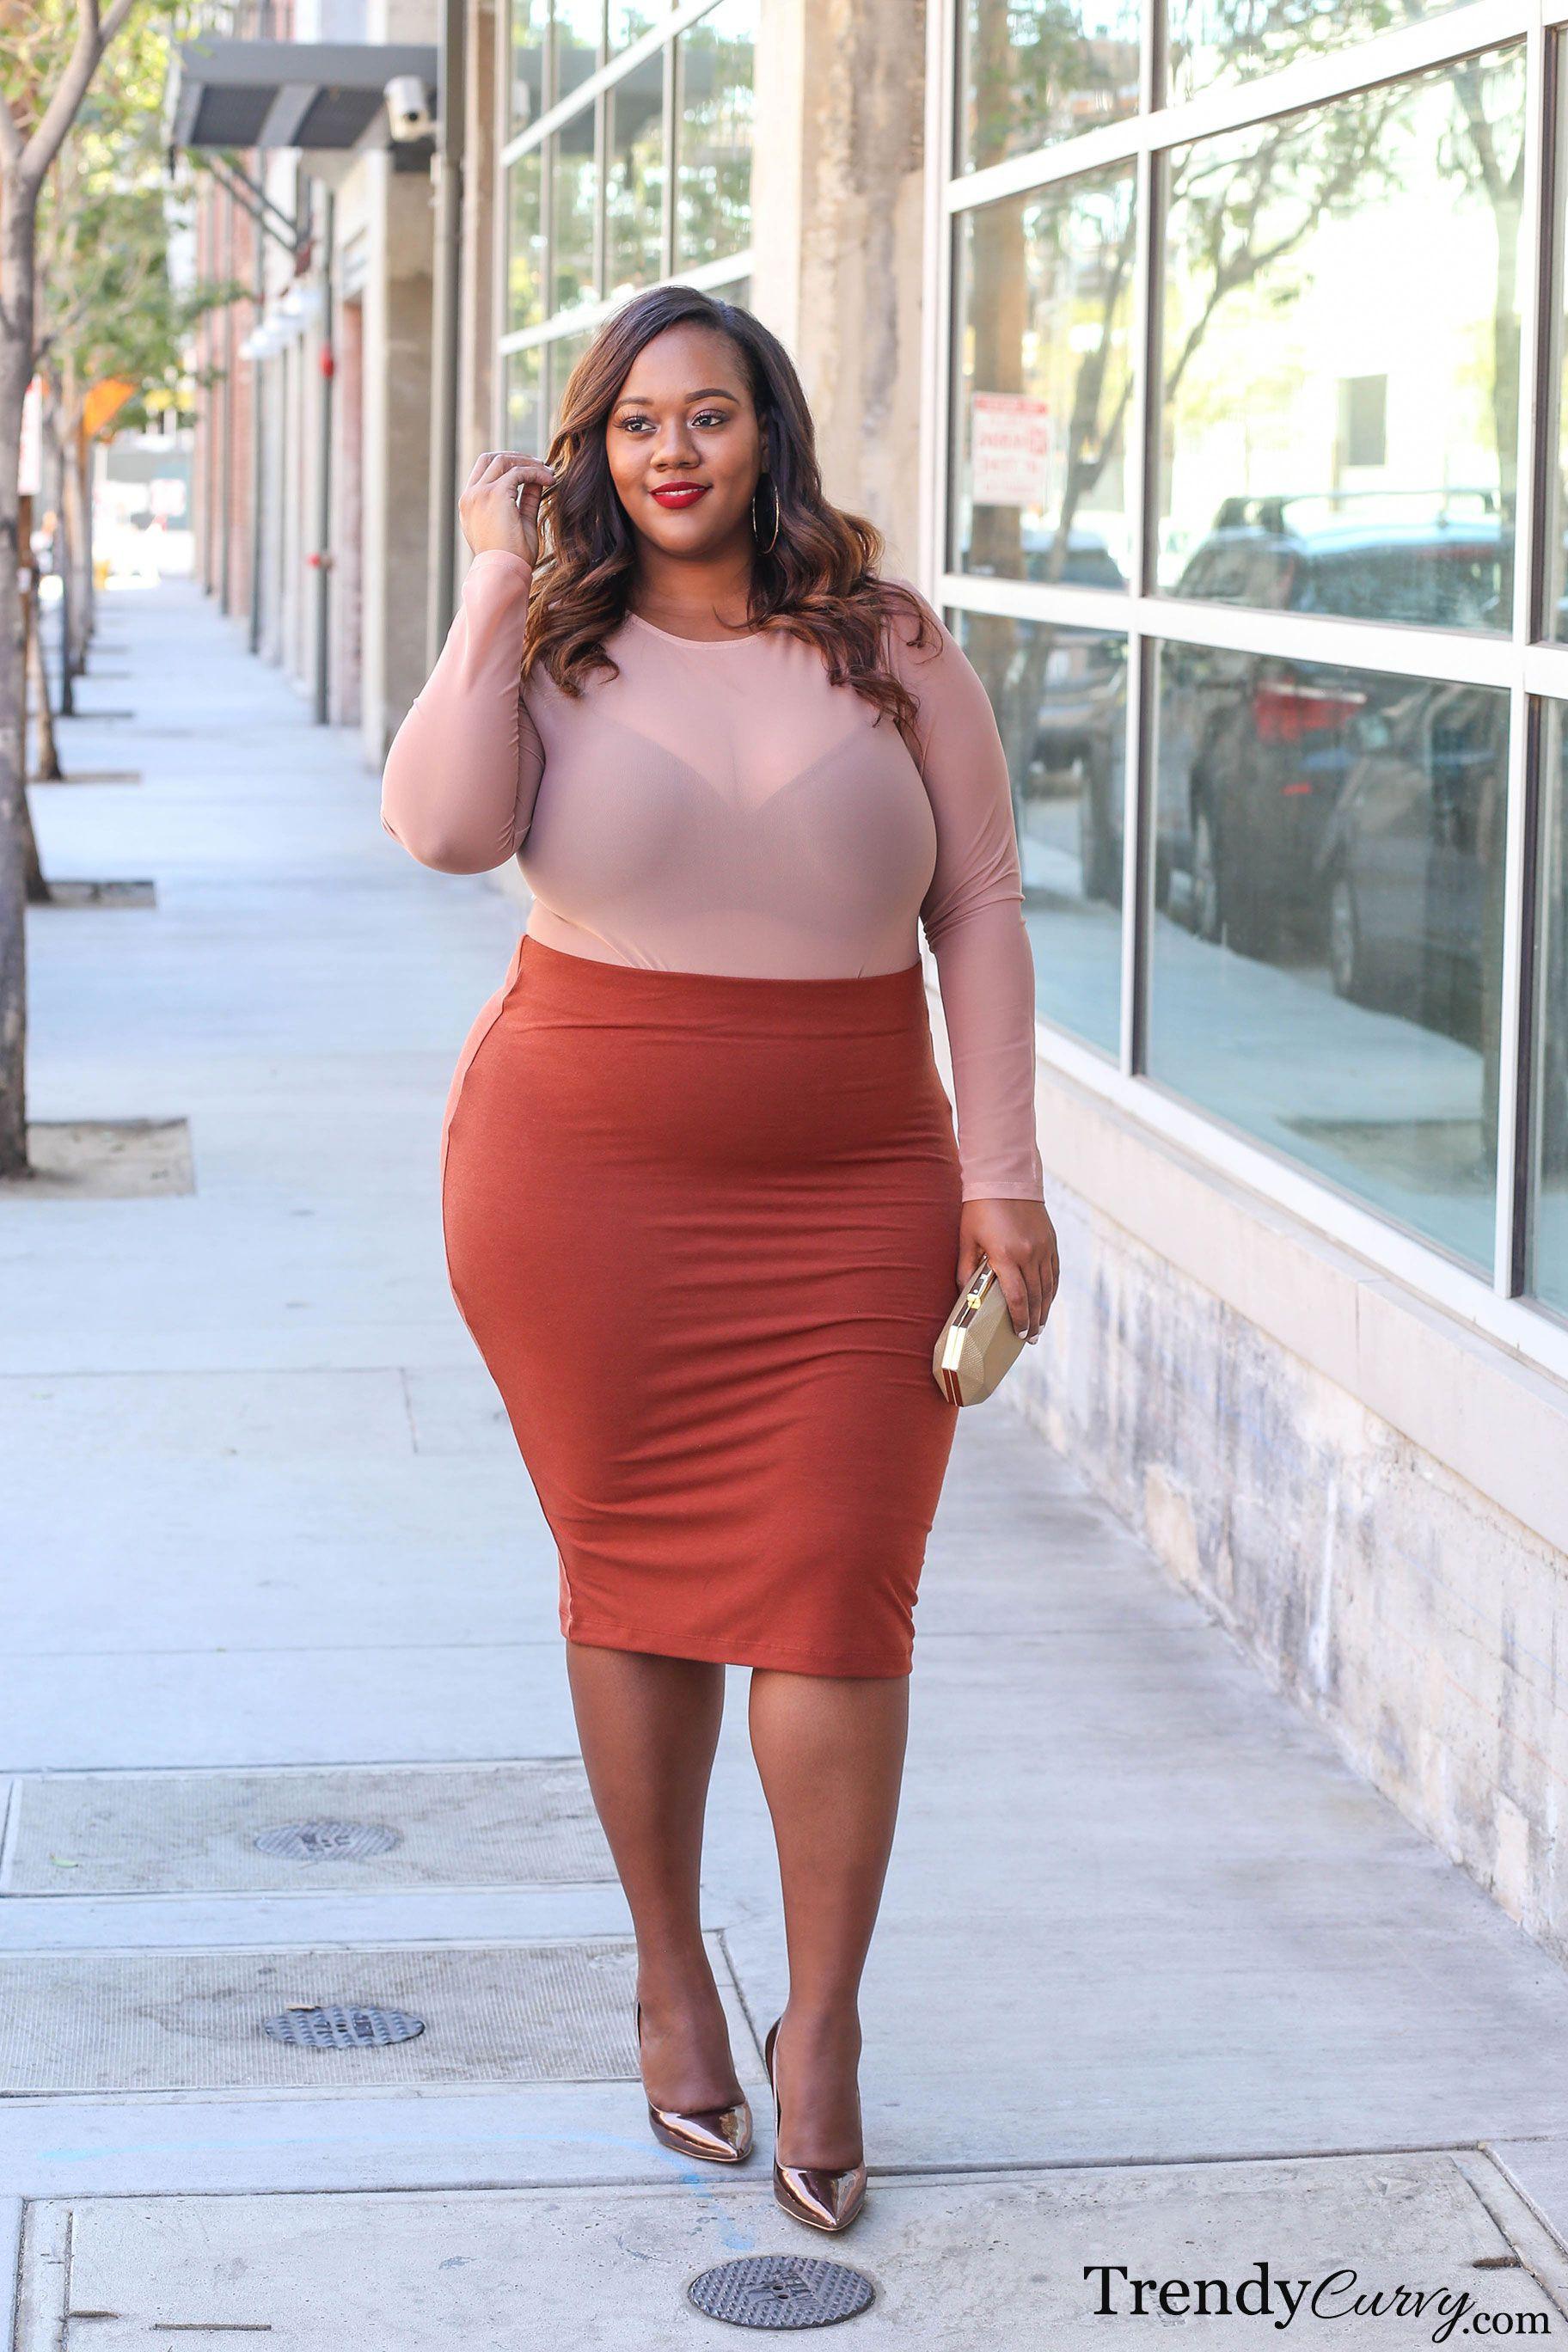 Women favorite trendy curves, Plus-size clothing